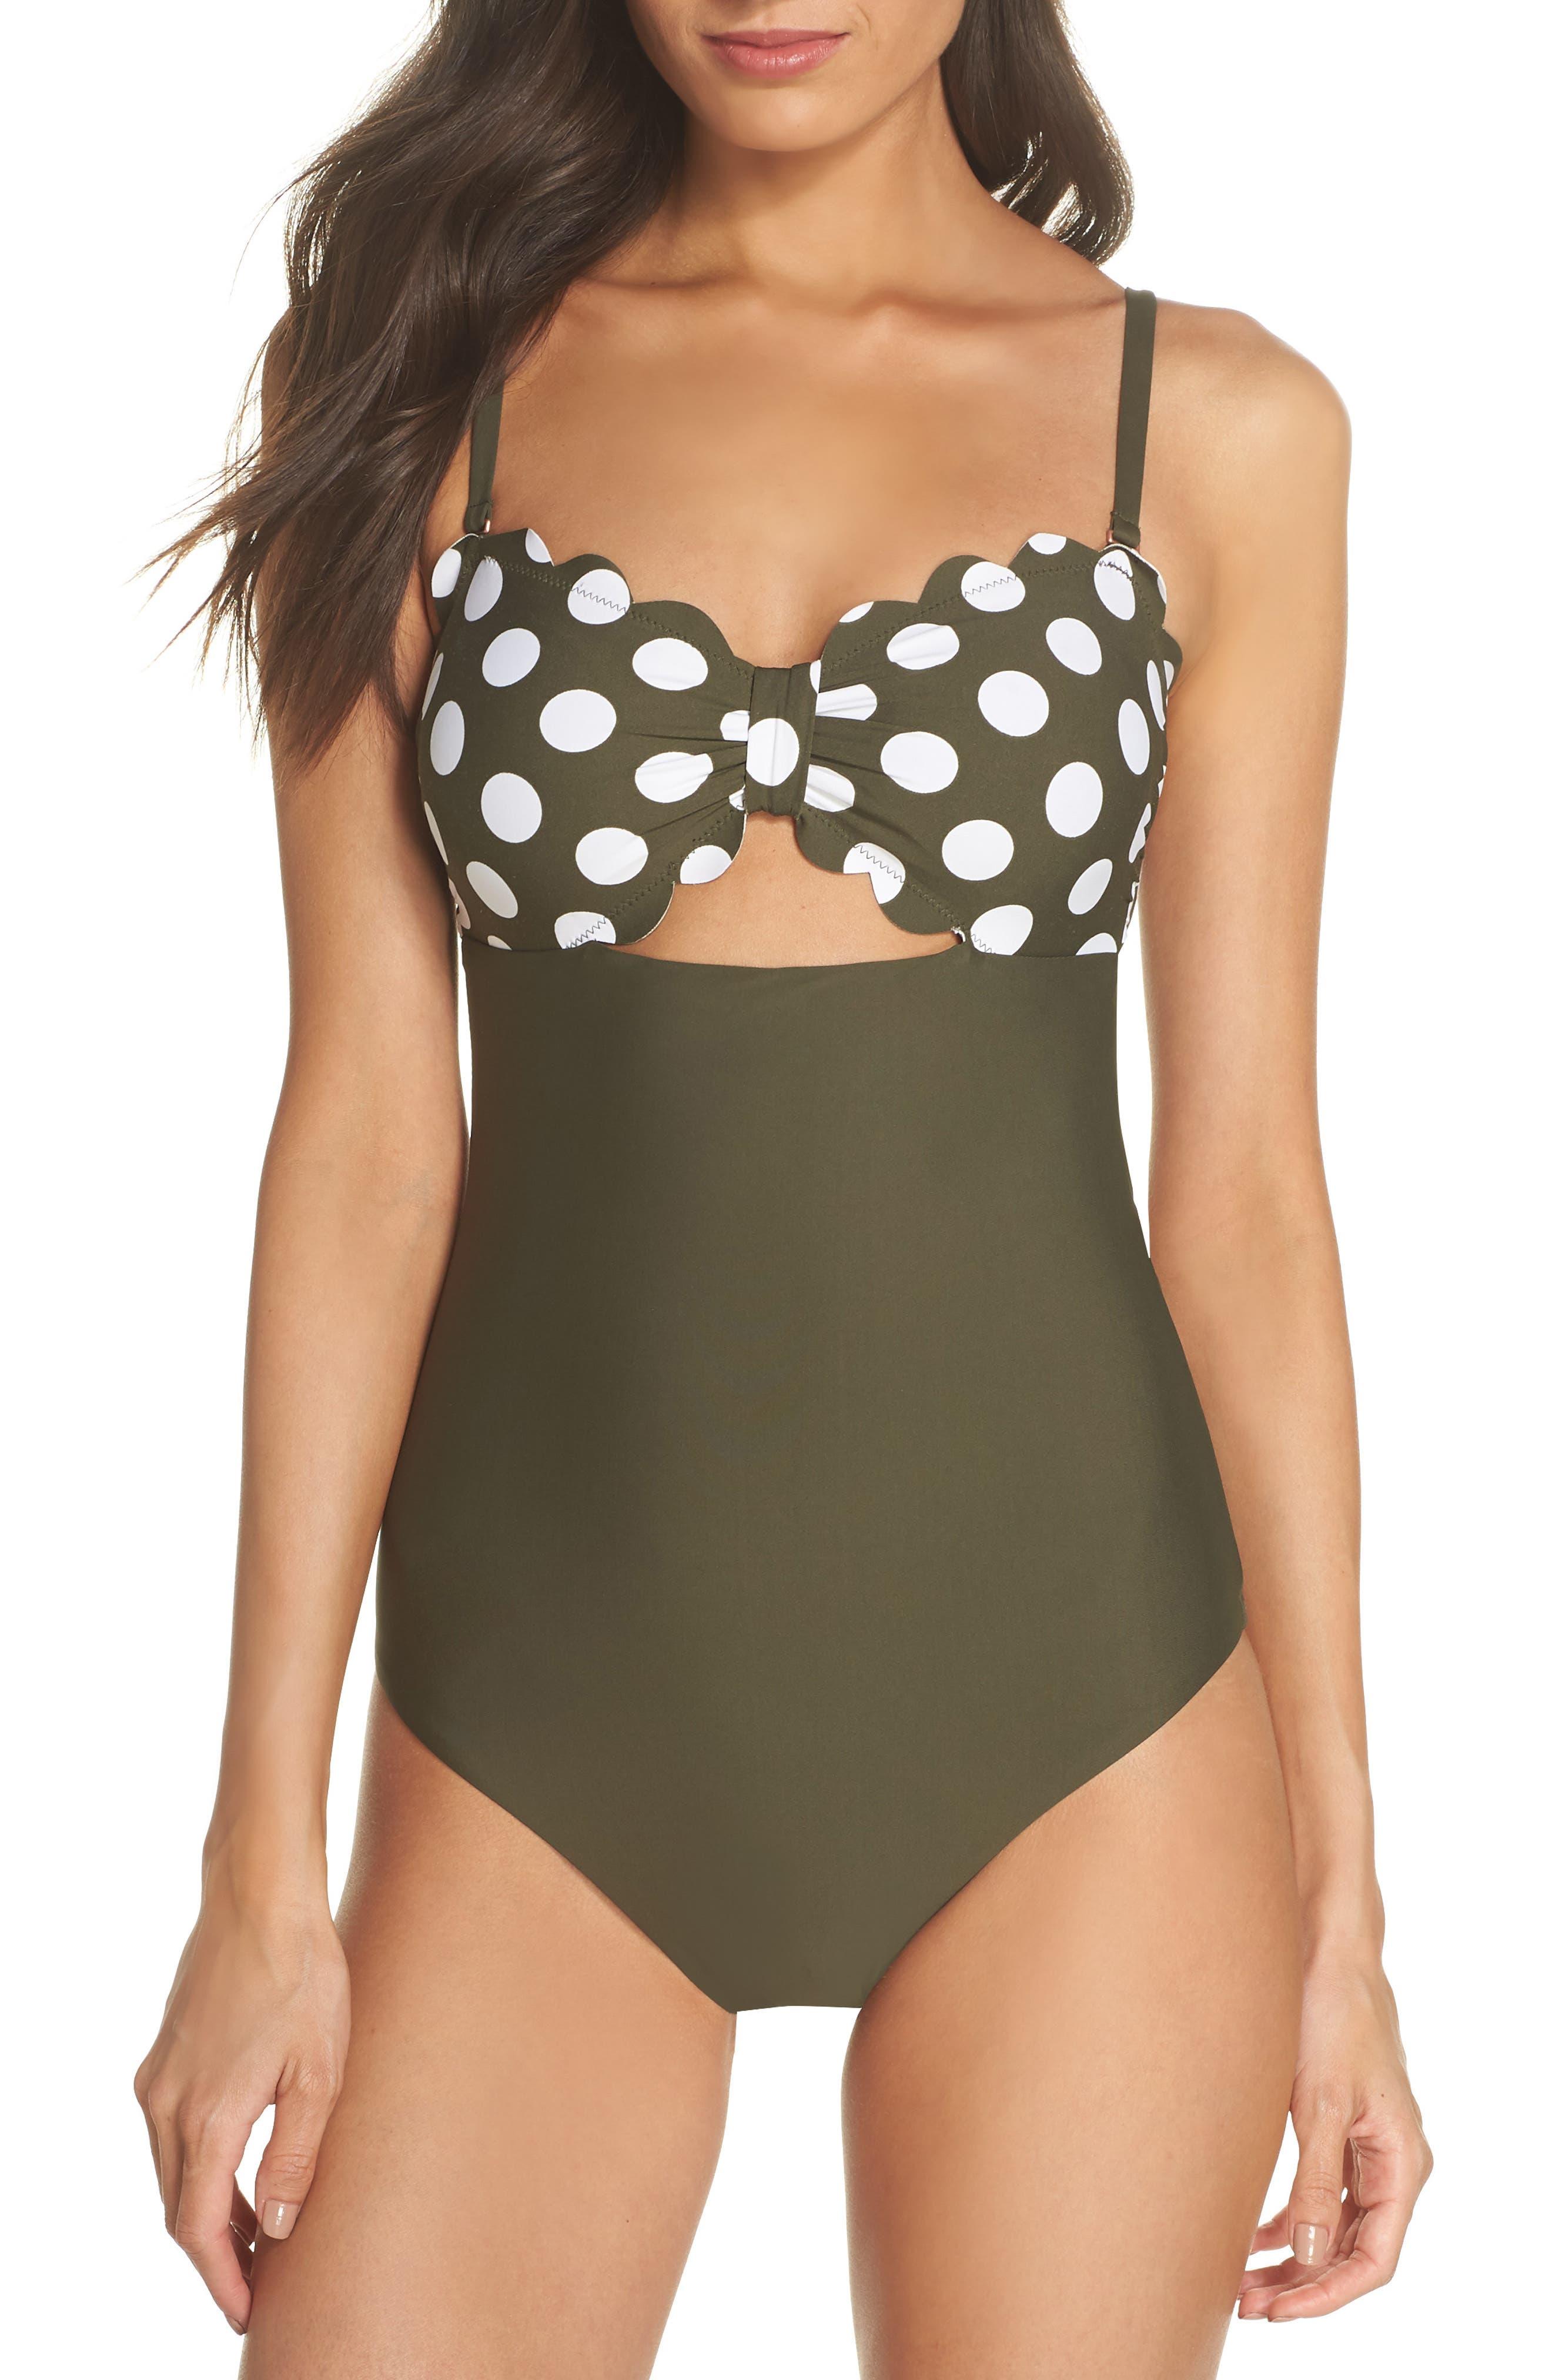 Scallop Bandeau One-Piece Swimsuit,                             Alternate thumbnail 2, color,                             OLIVE SARMA/ IVORY EGRET DOT